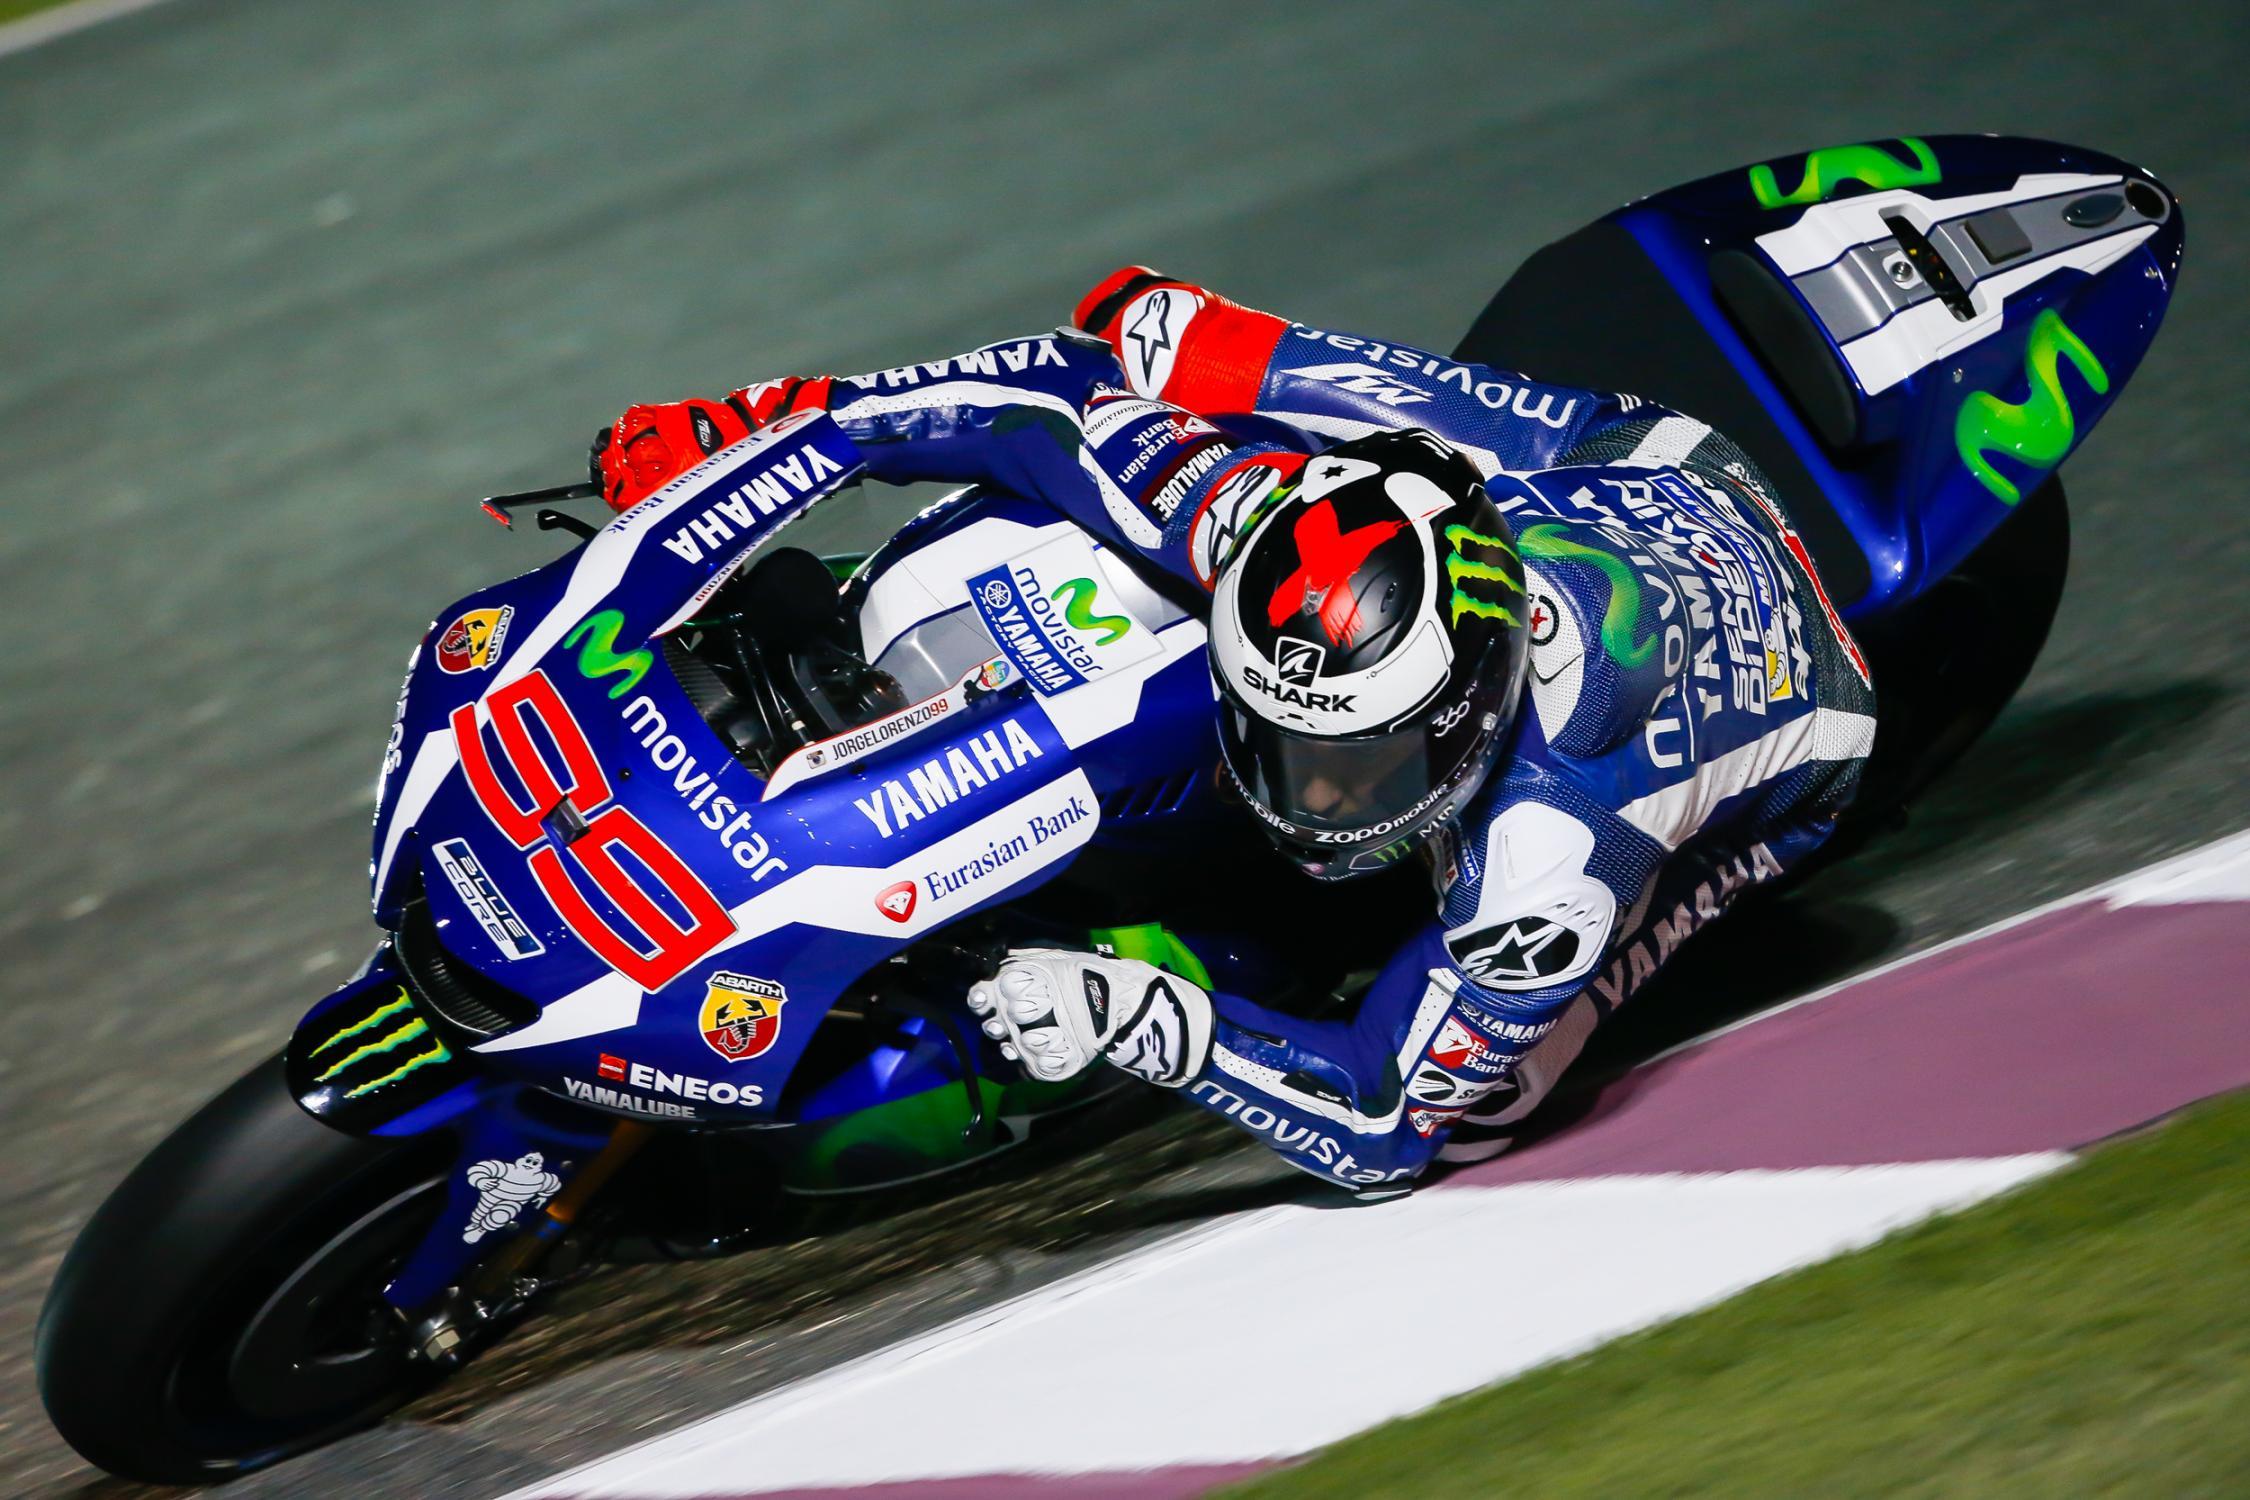 Test MotoGP Qatar 2016 99-lorenzo_gp_8681.gallery_full_top_fullscreen